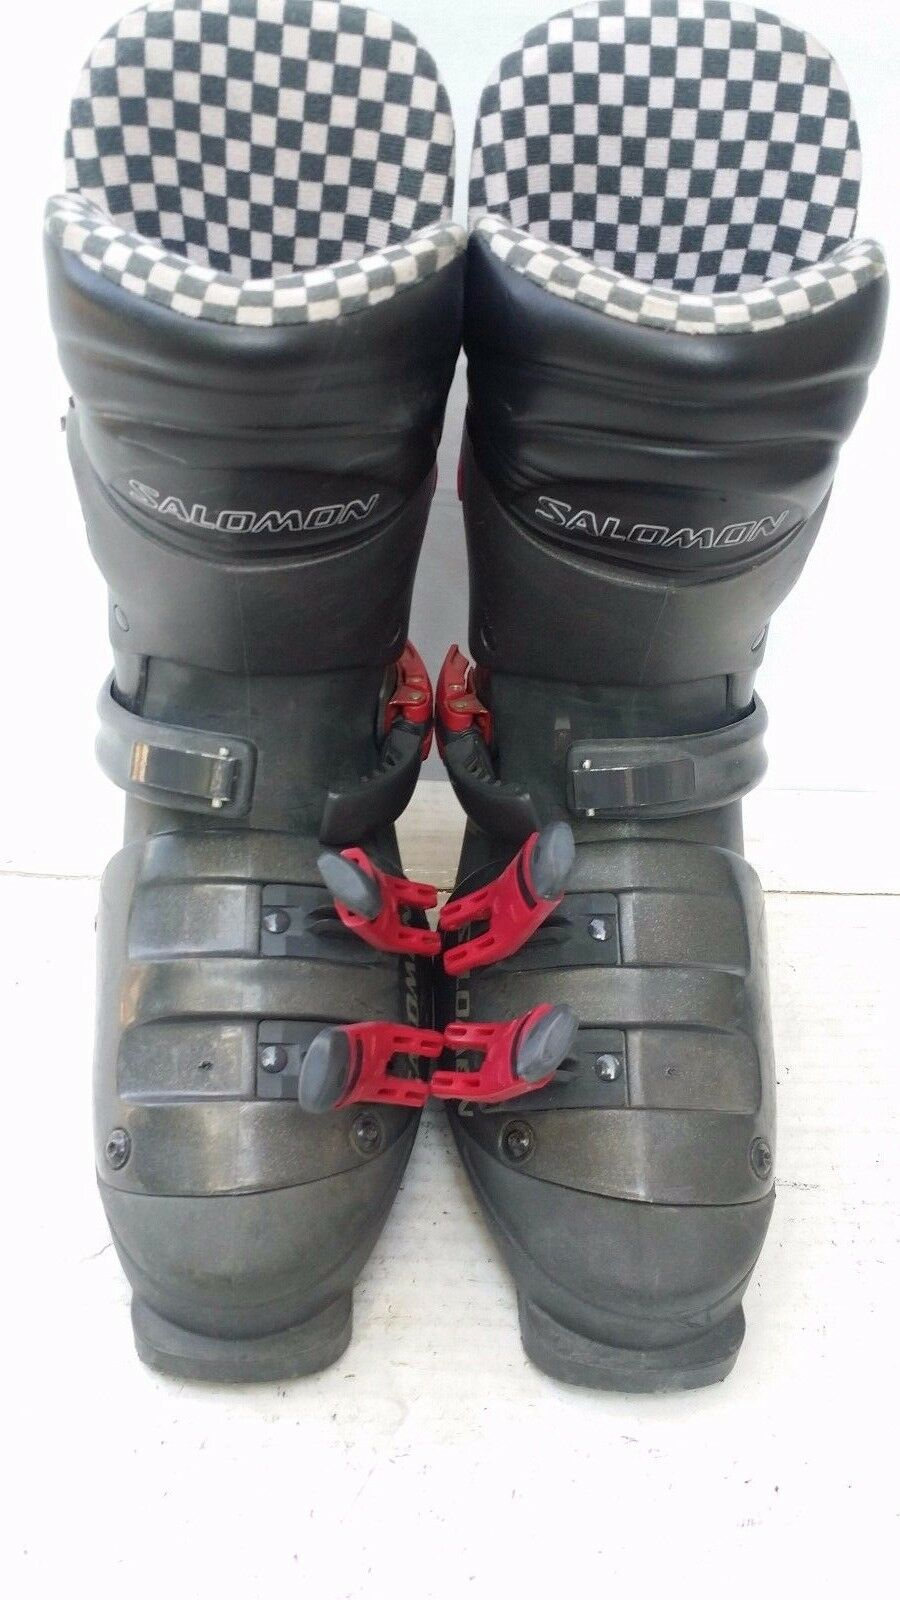 Salomon Optima EXP 80 Downhill Ski Boots Size 330 26